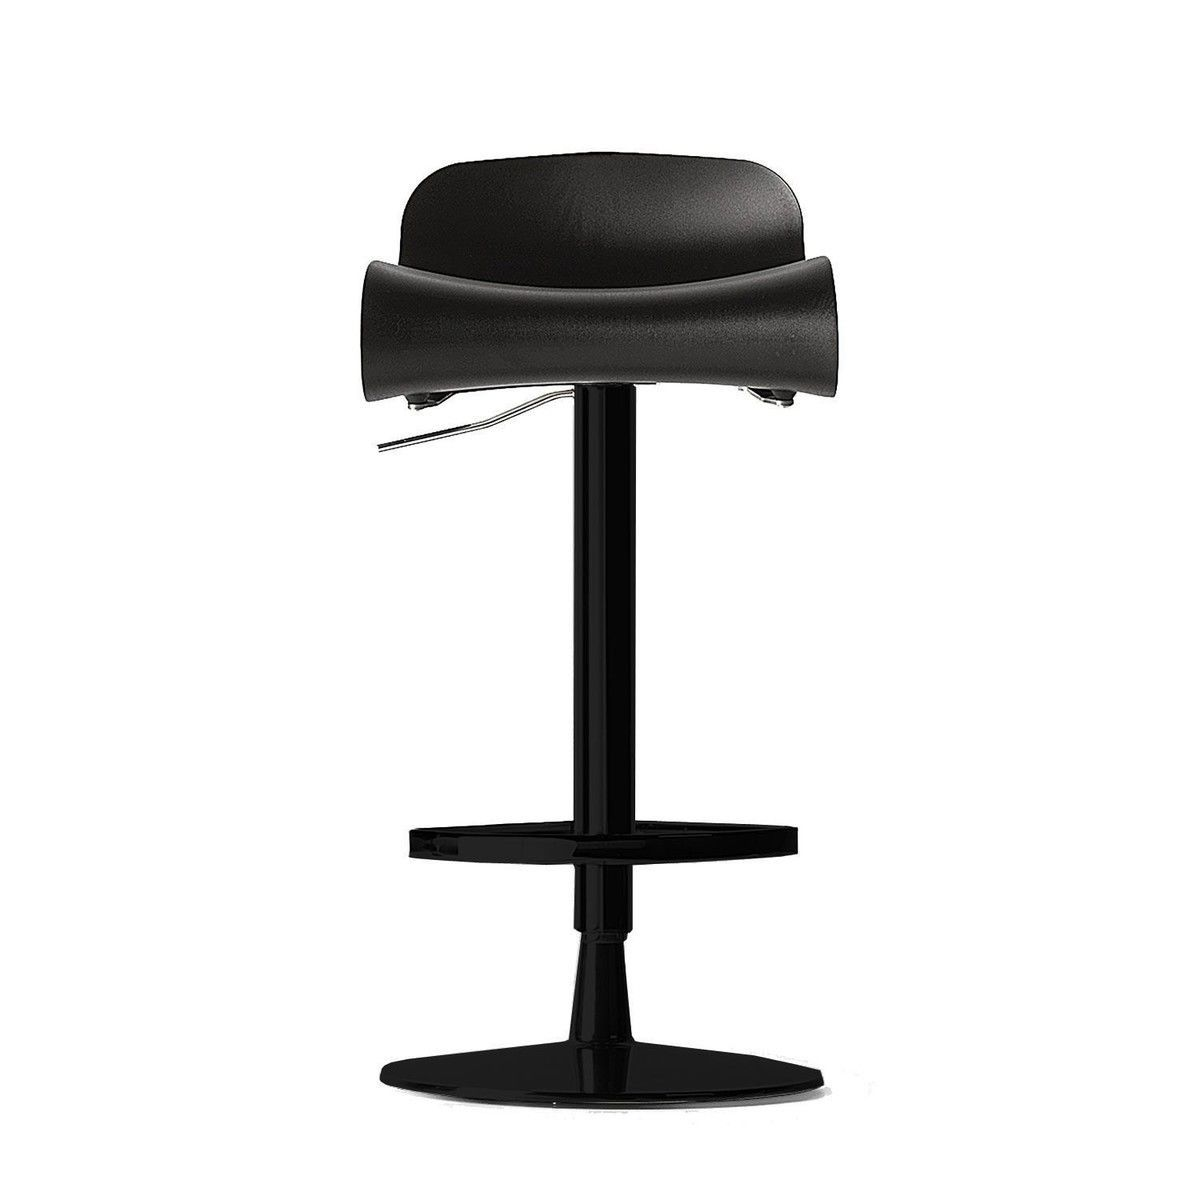 Kristalia - BCN Stool / Bar Stool adjustable - black/frame round/lacquered/  sc 1 st  AmbienteDirect & BCN Stool/Bar Stool adjustable | Kristalia | AmbienteDirect.com islam-shia.org